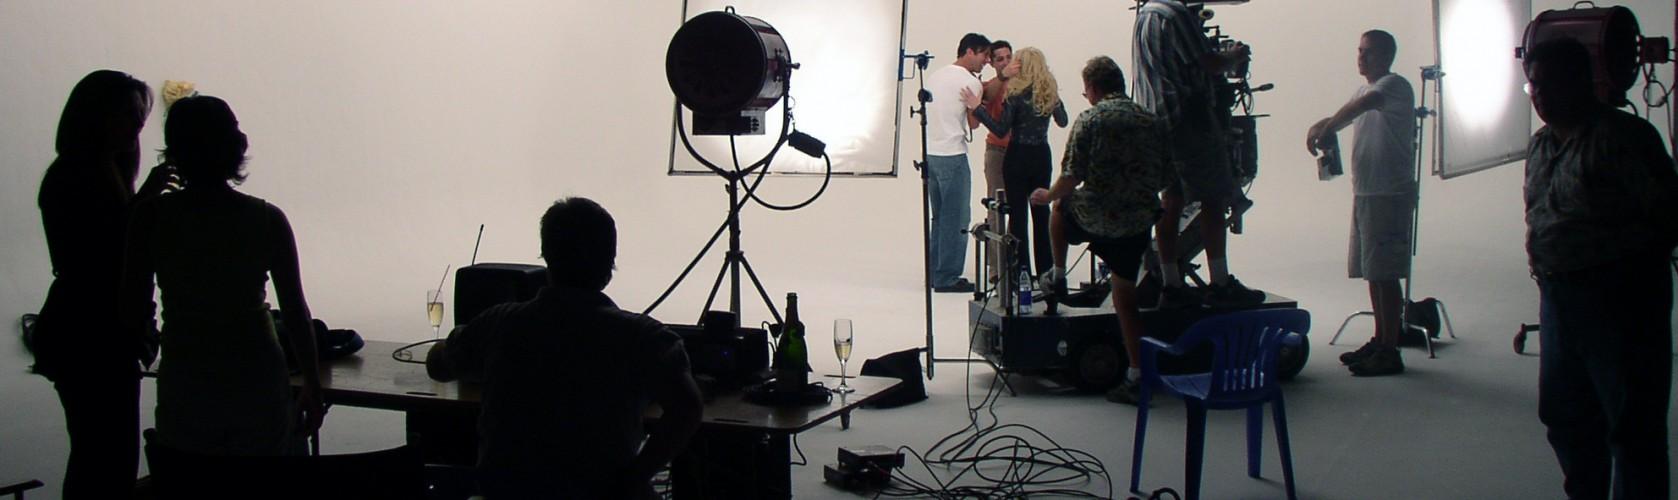 Music video shoot in studio Jan. 16th 2005 Miami Florida